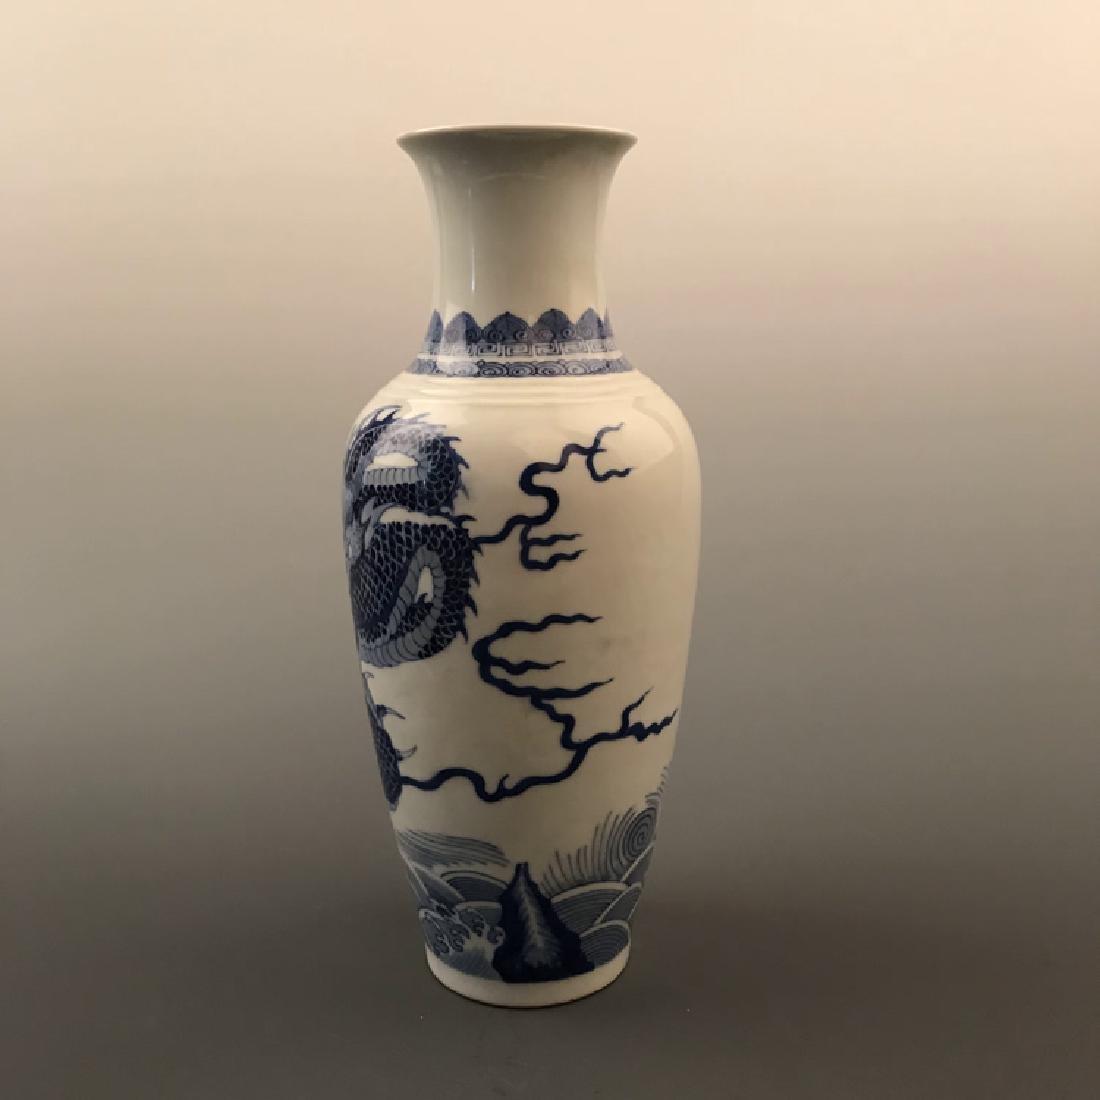 Chinese Blue and white Dragon Vase with Kangxi Mark - 6